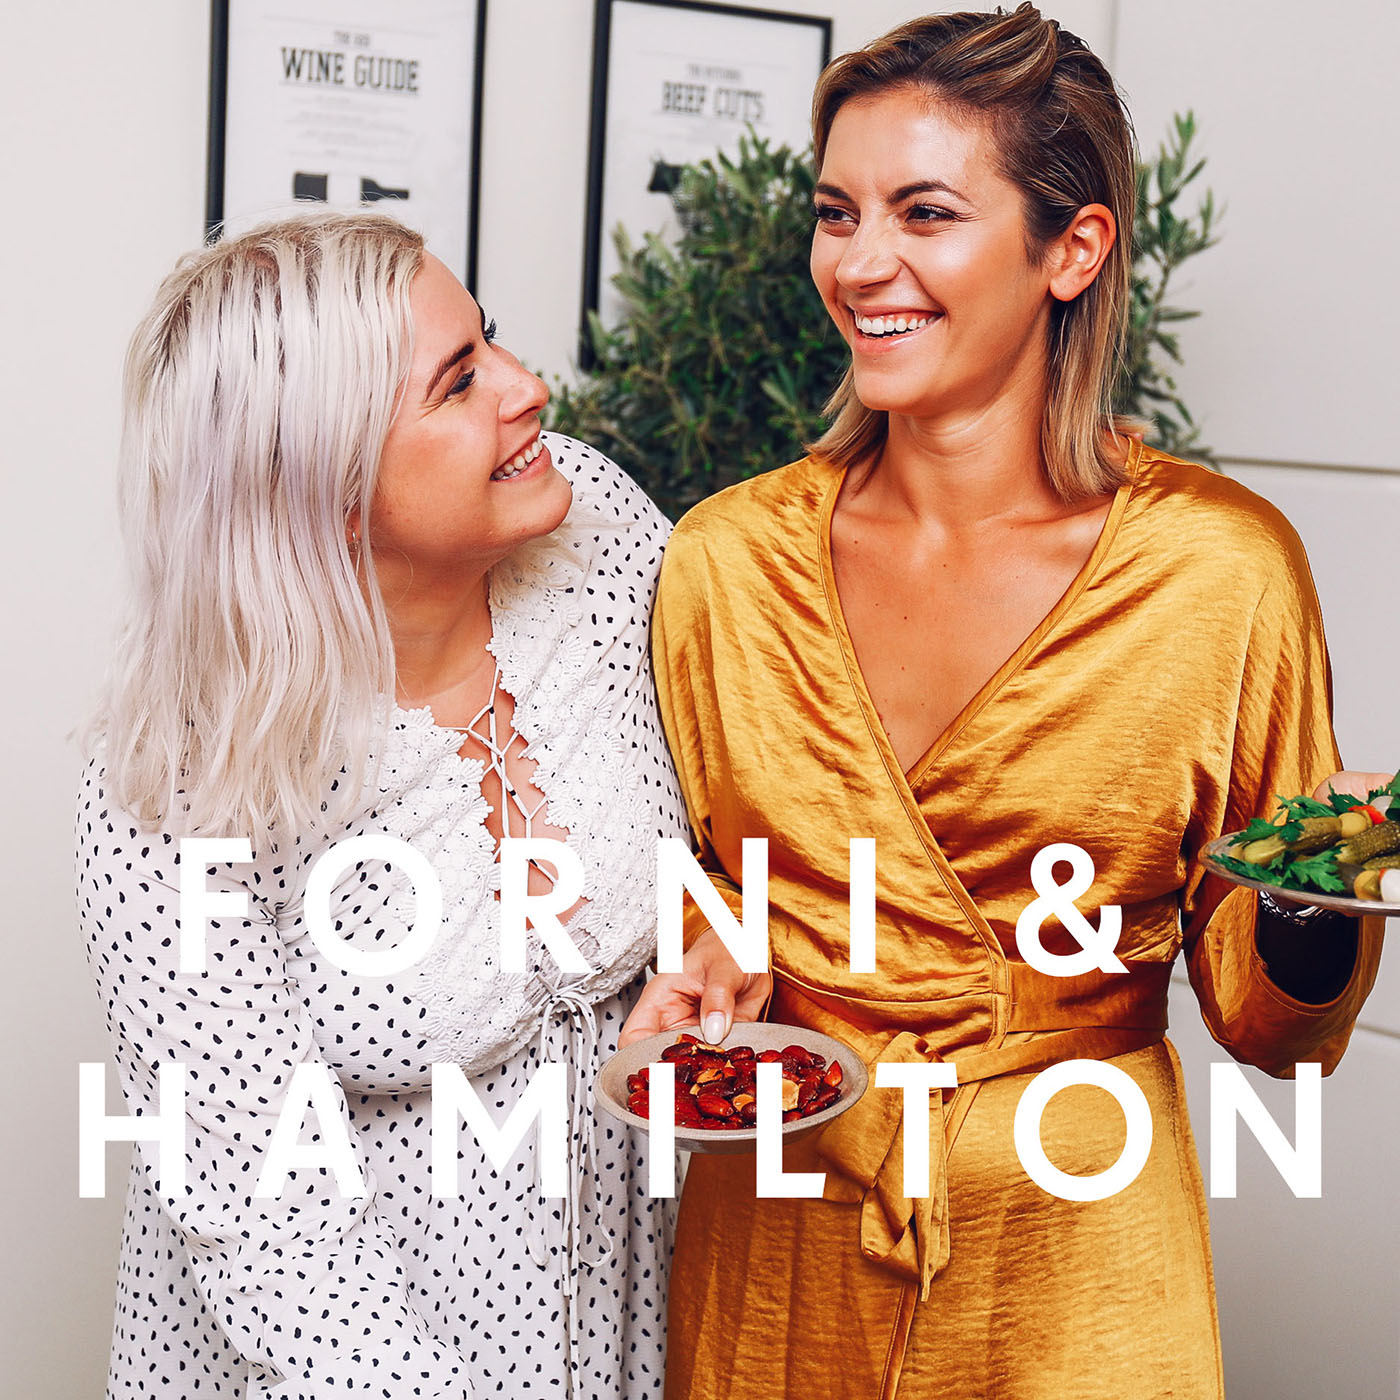 Forni & Hamilton show art